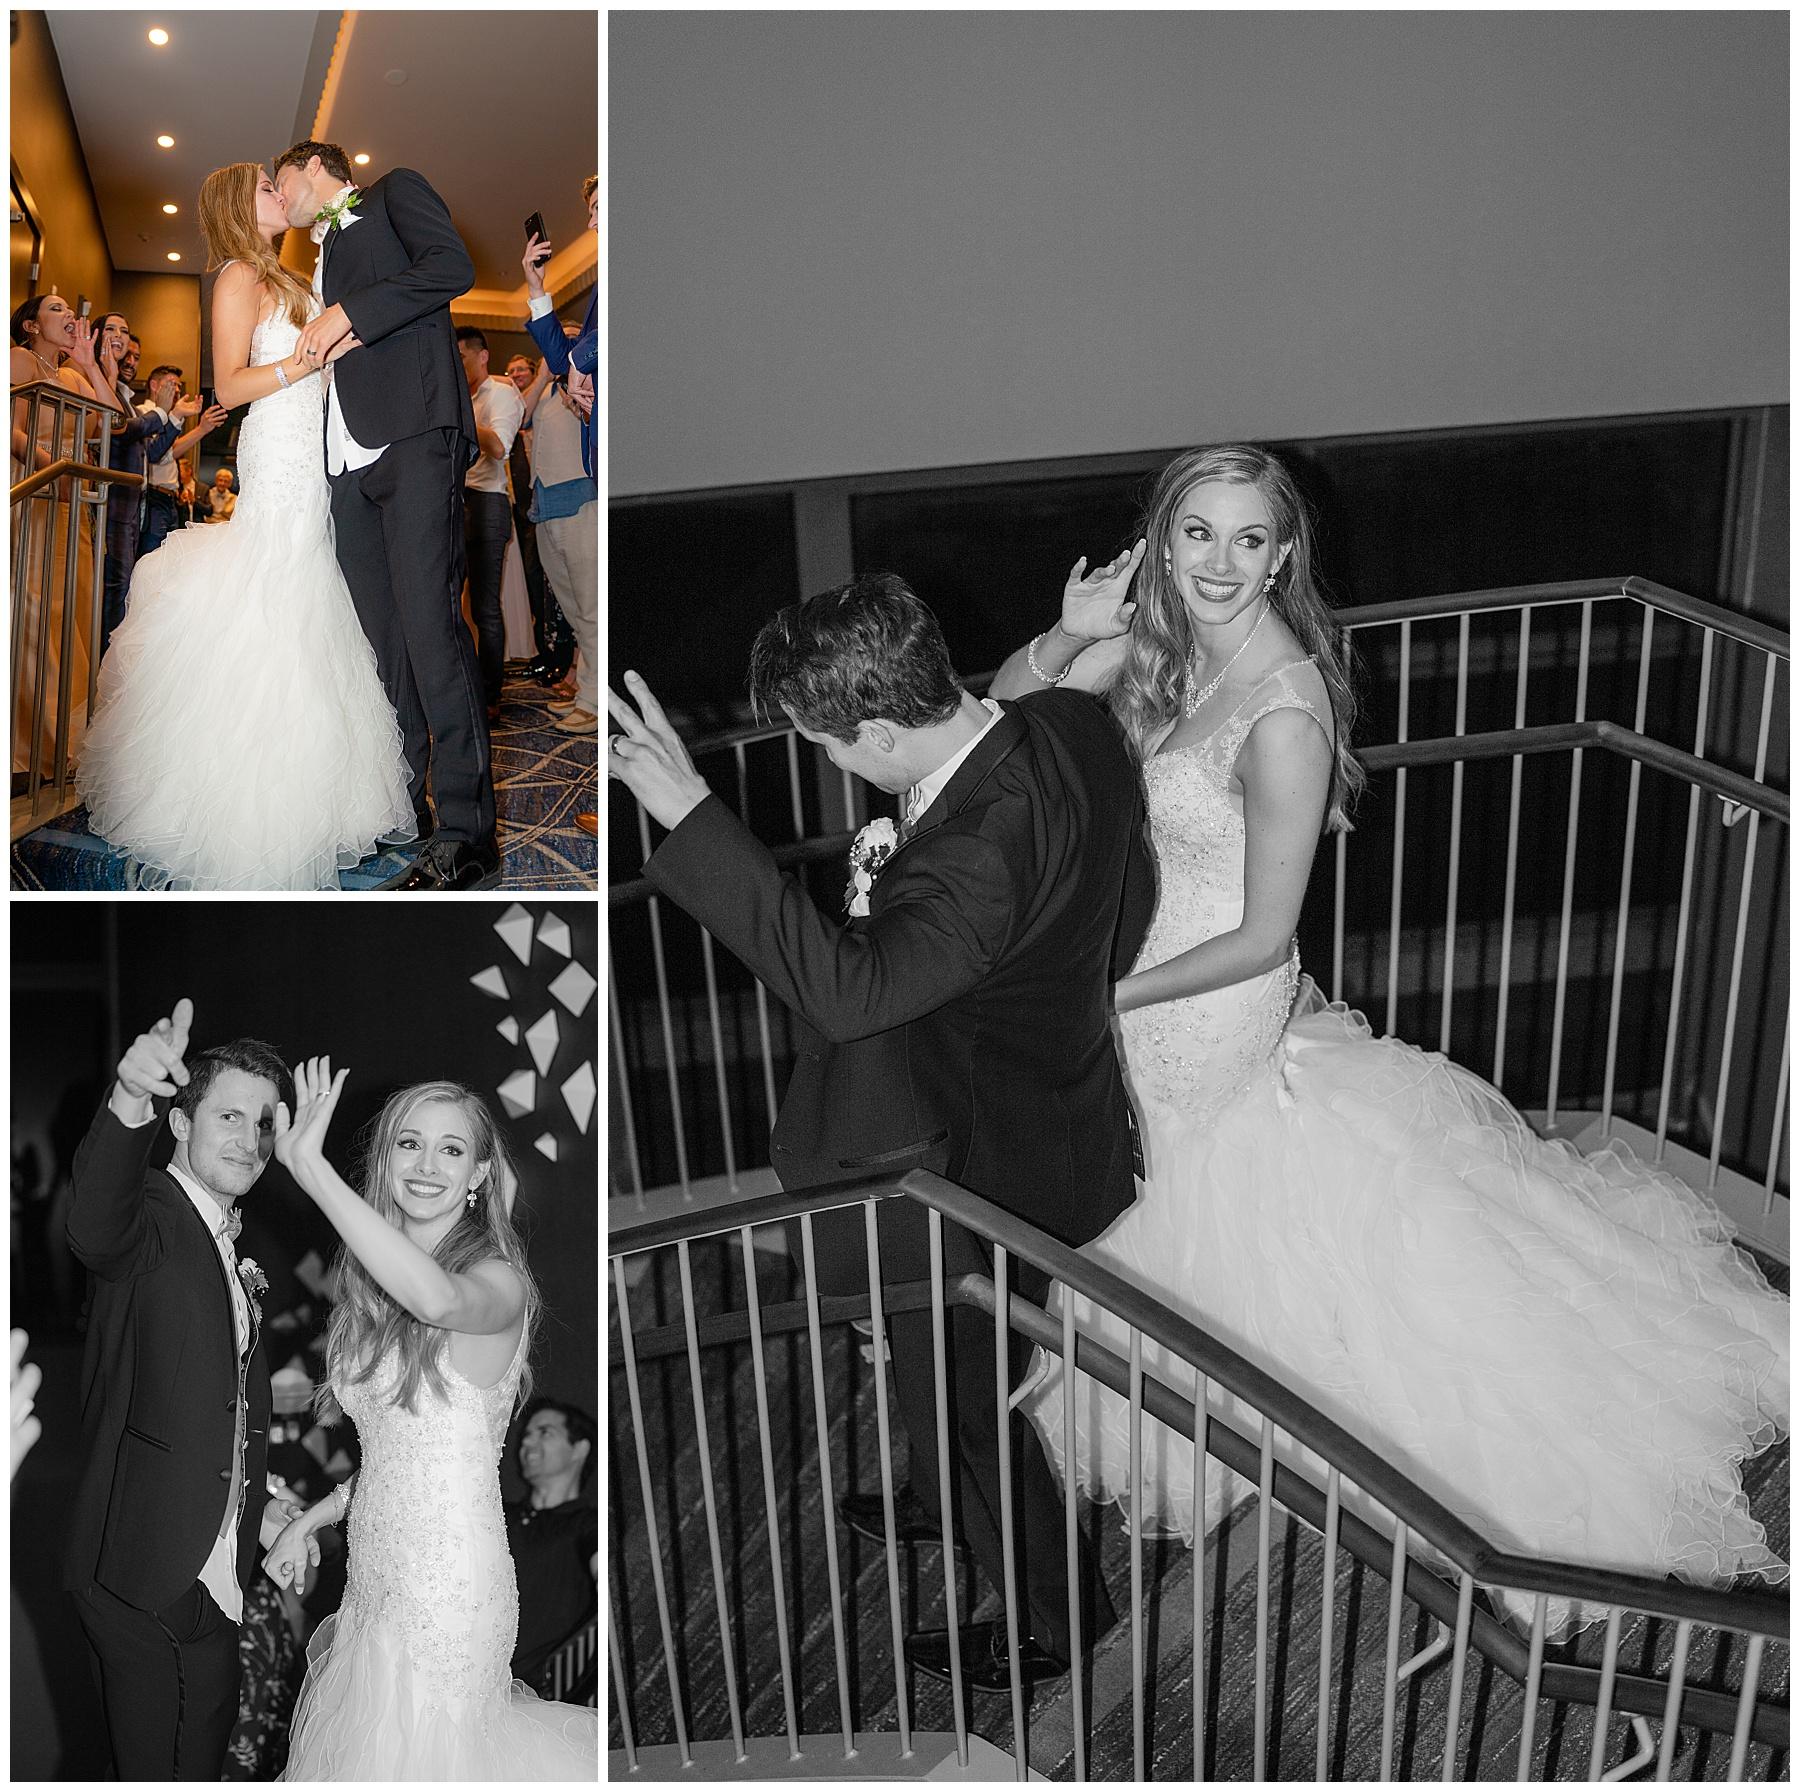 marriott marina del rey wedding exit